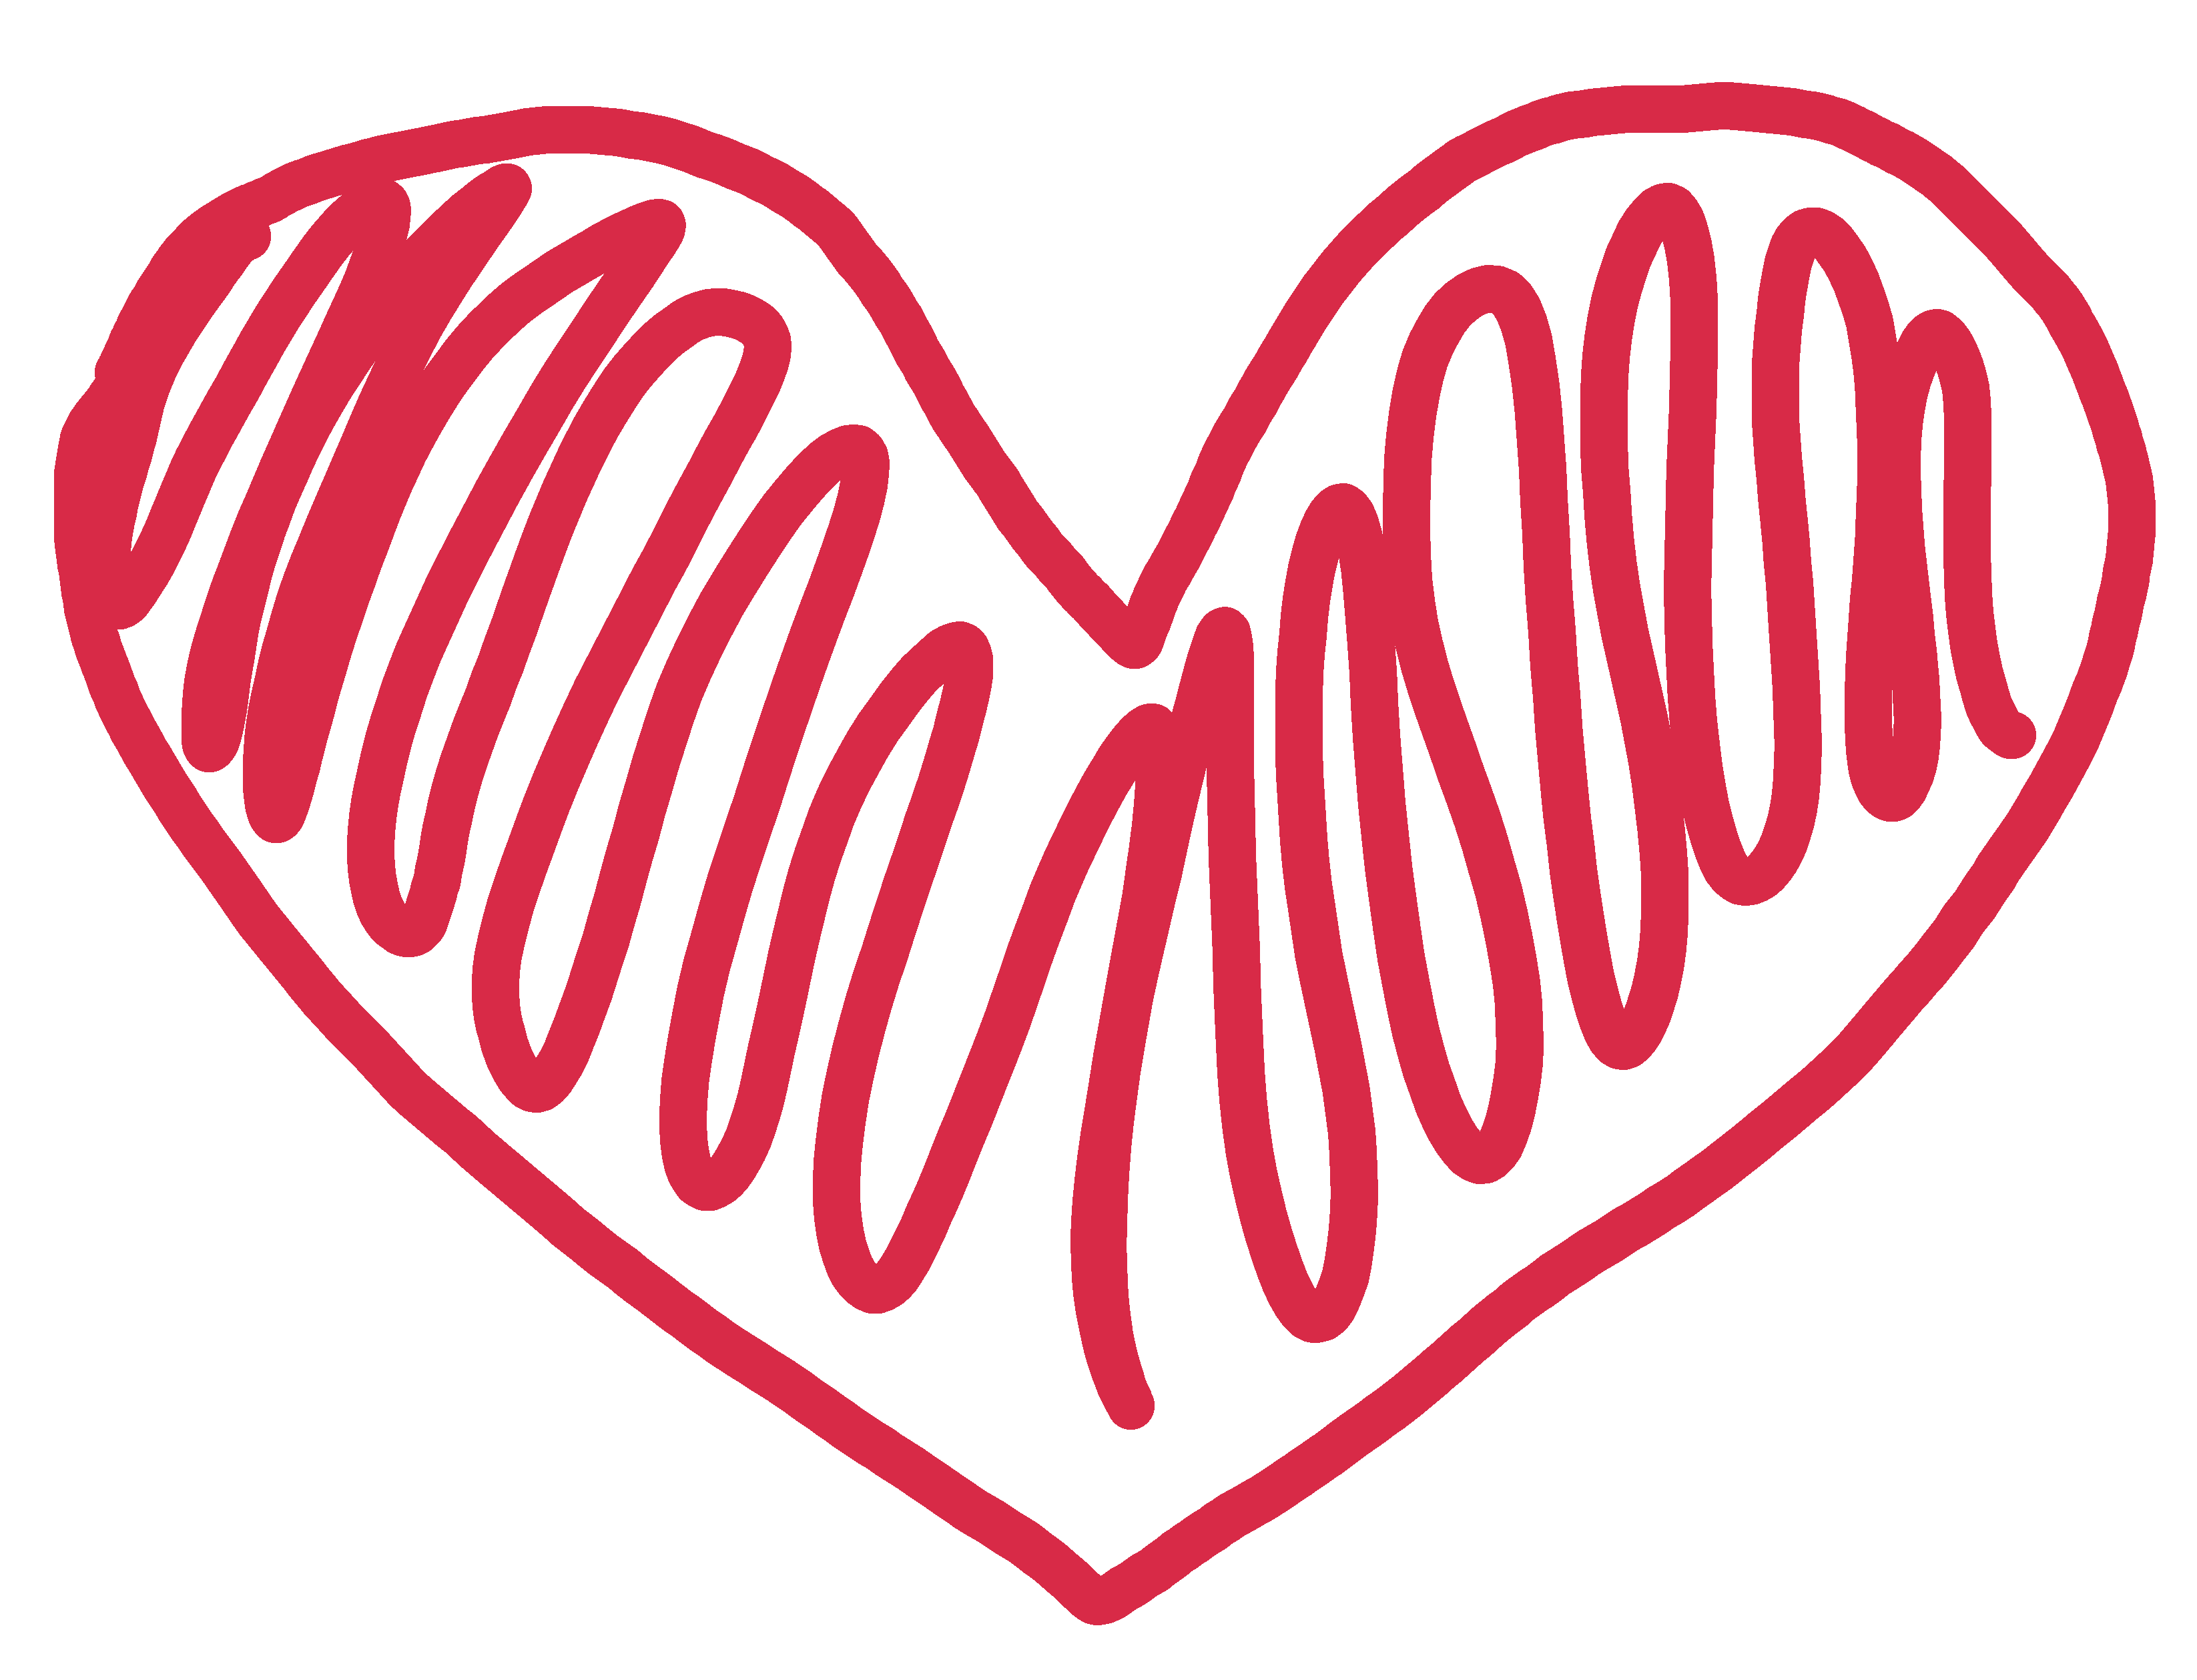 Open Heart Clipart | Free download best Open Heart Clipart on ...